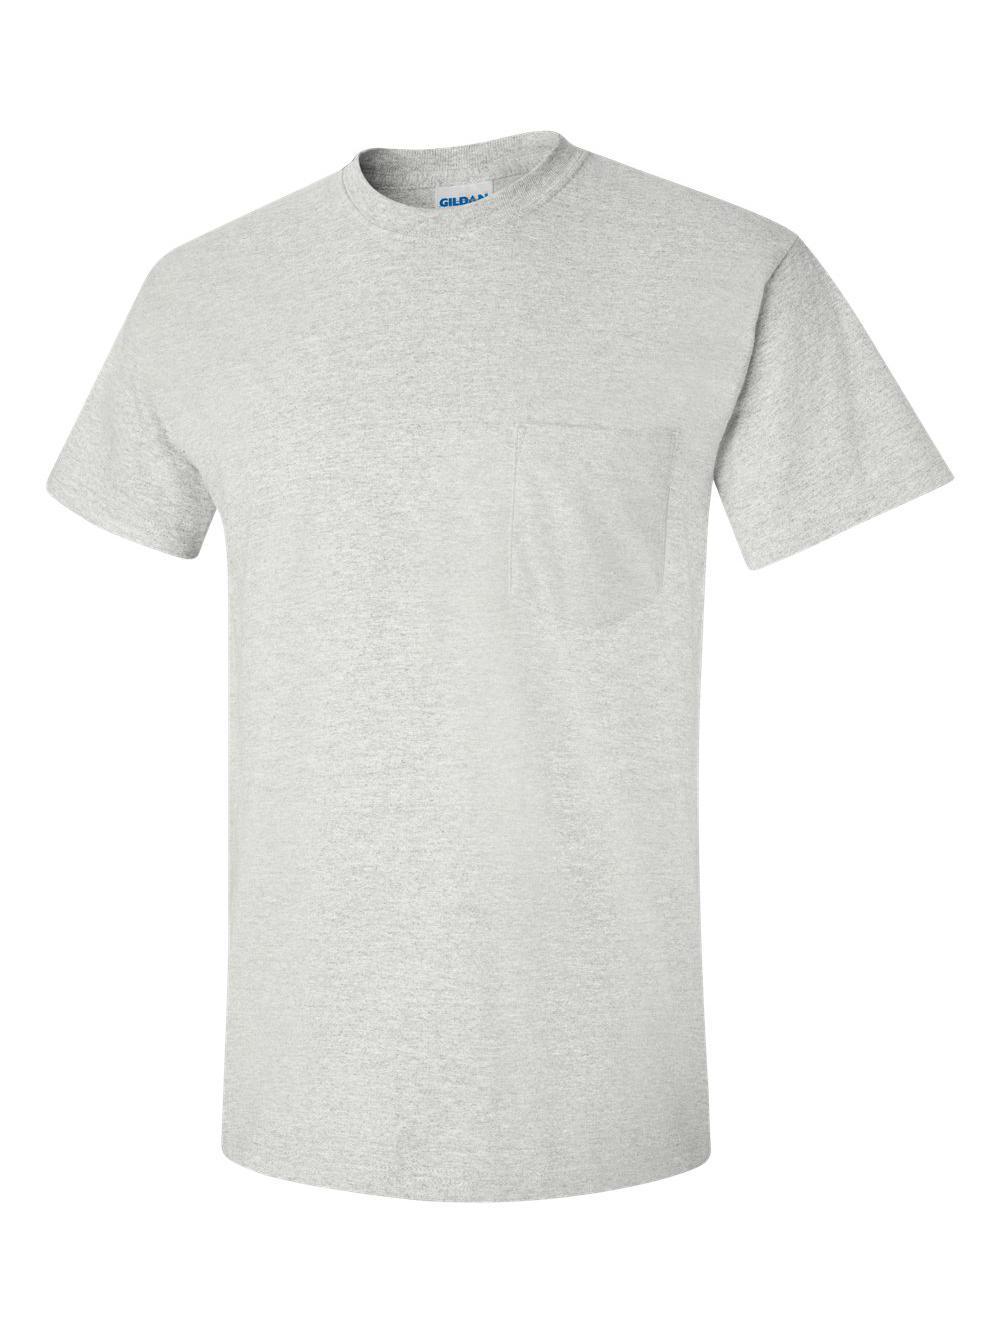 Gildan-Ultra-Cotton-T-Shirt-with-a-Pocket-2300 thumbnail 3